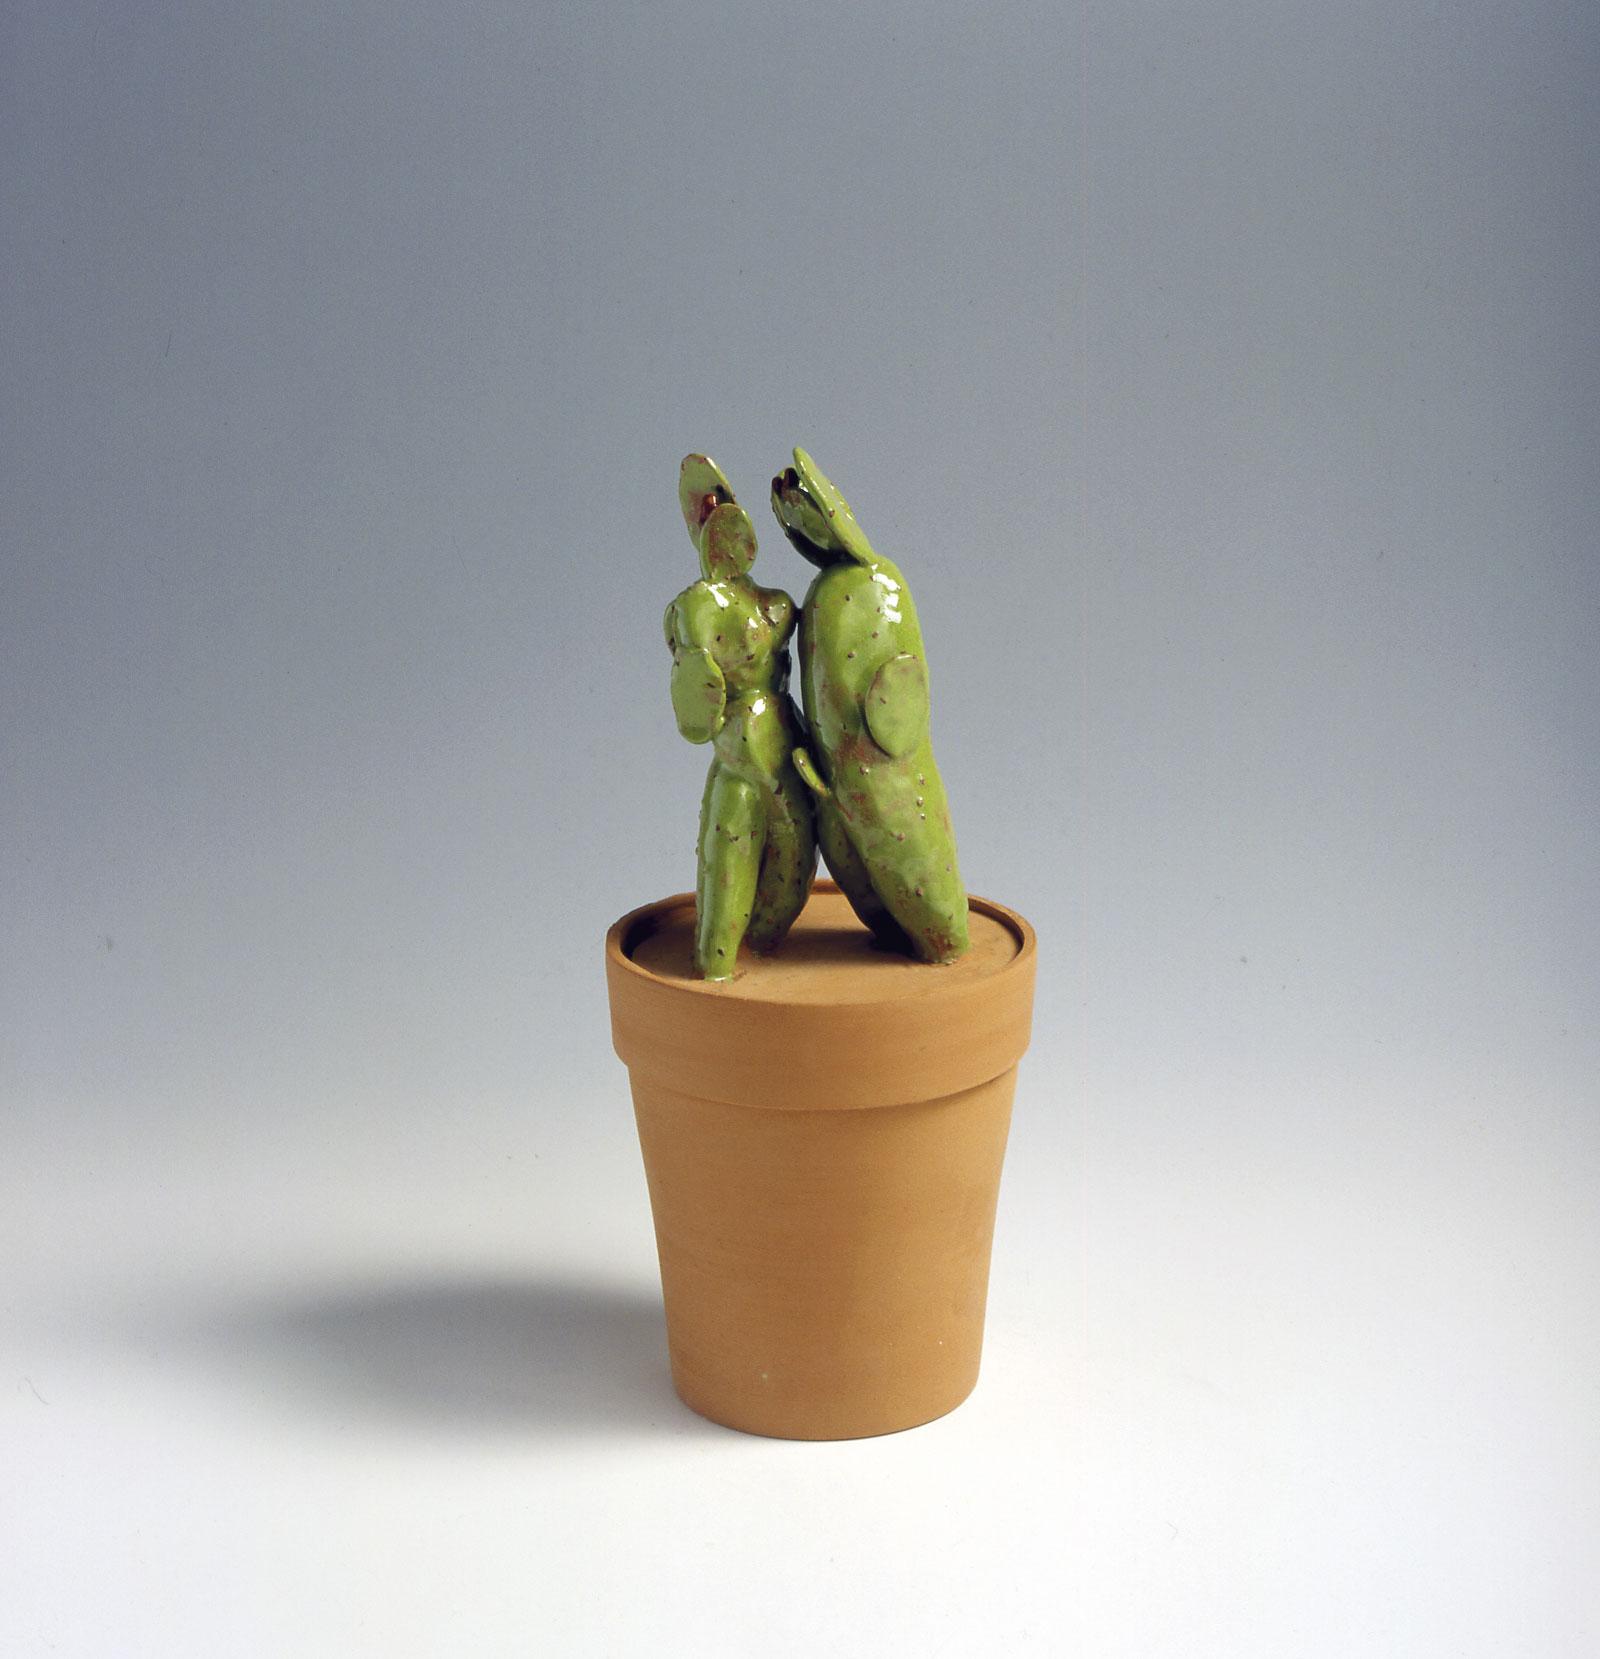 5 Vie Cactus Ugo La Pietra